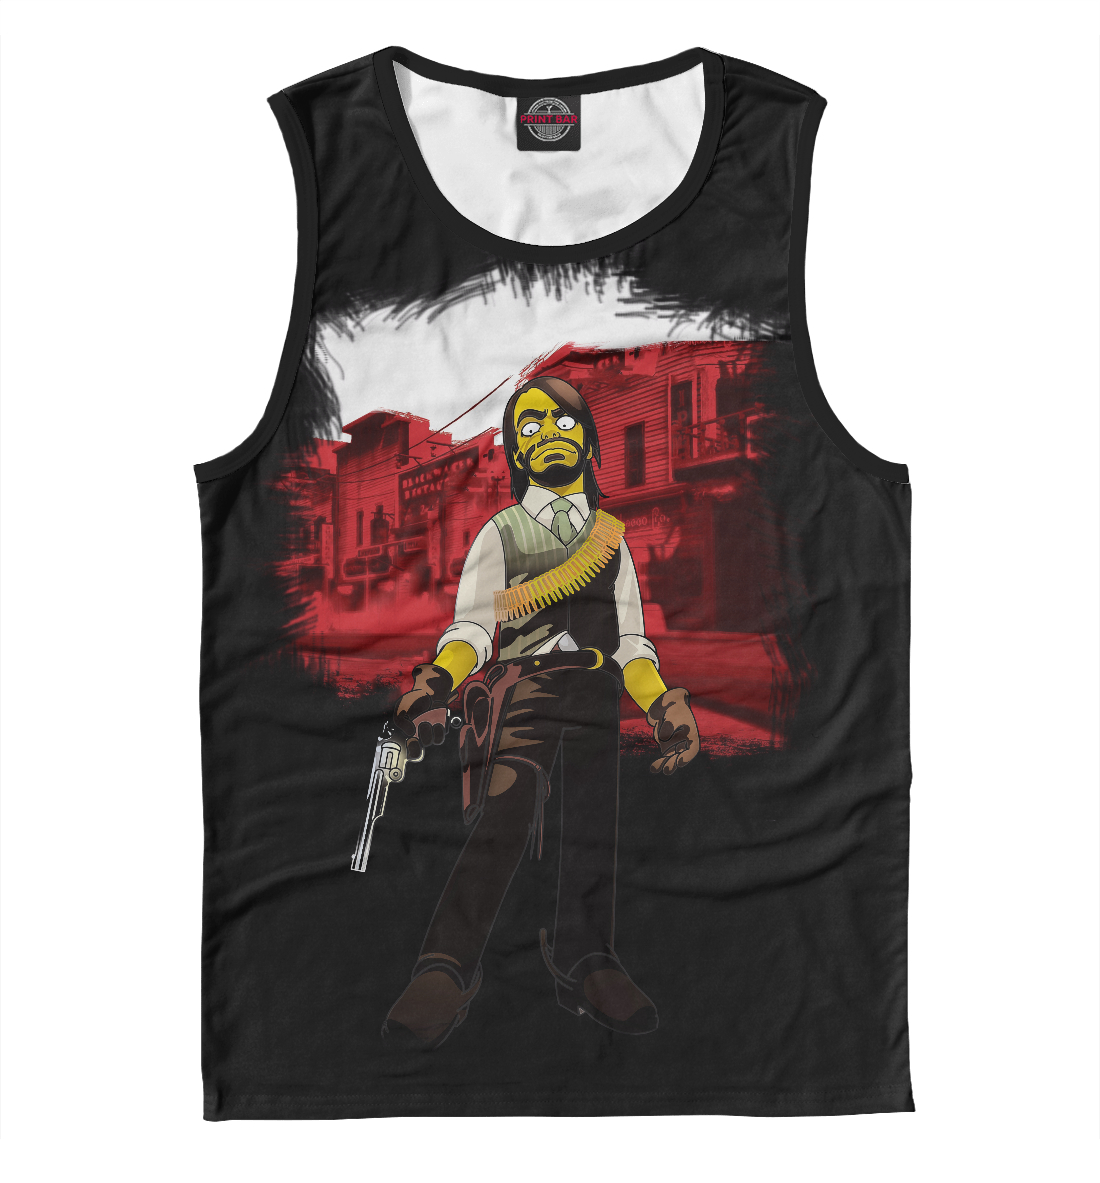 Купить Red Dead Redemption: The Simpsons Style, Printbar, Майки, ROC-591432-may-2